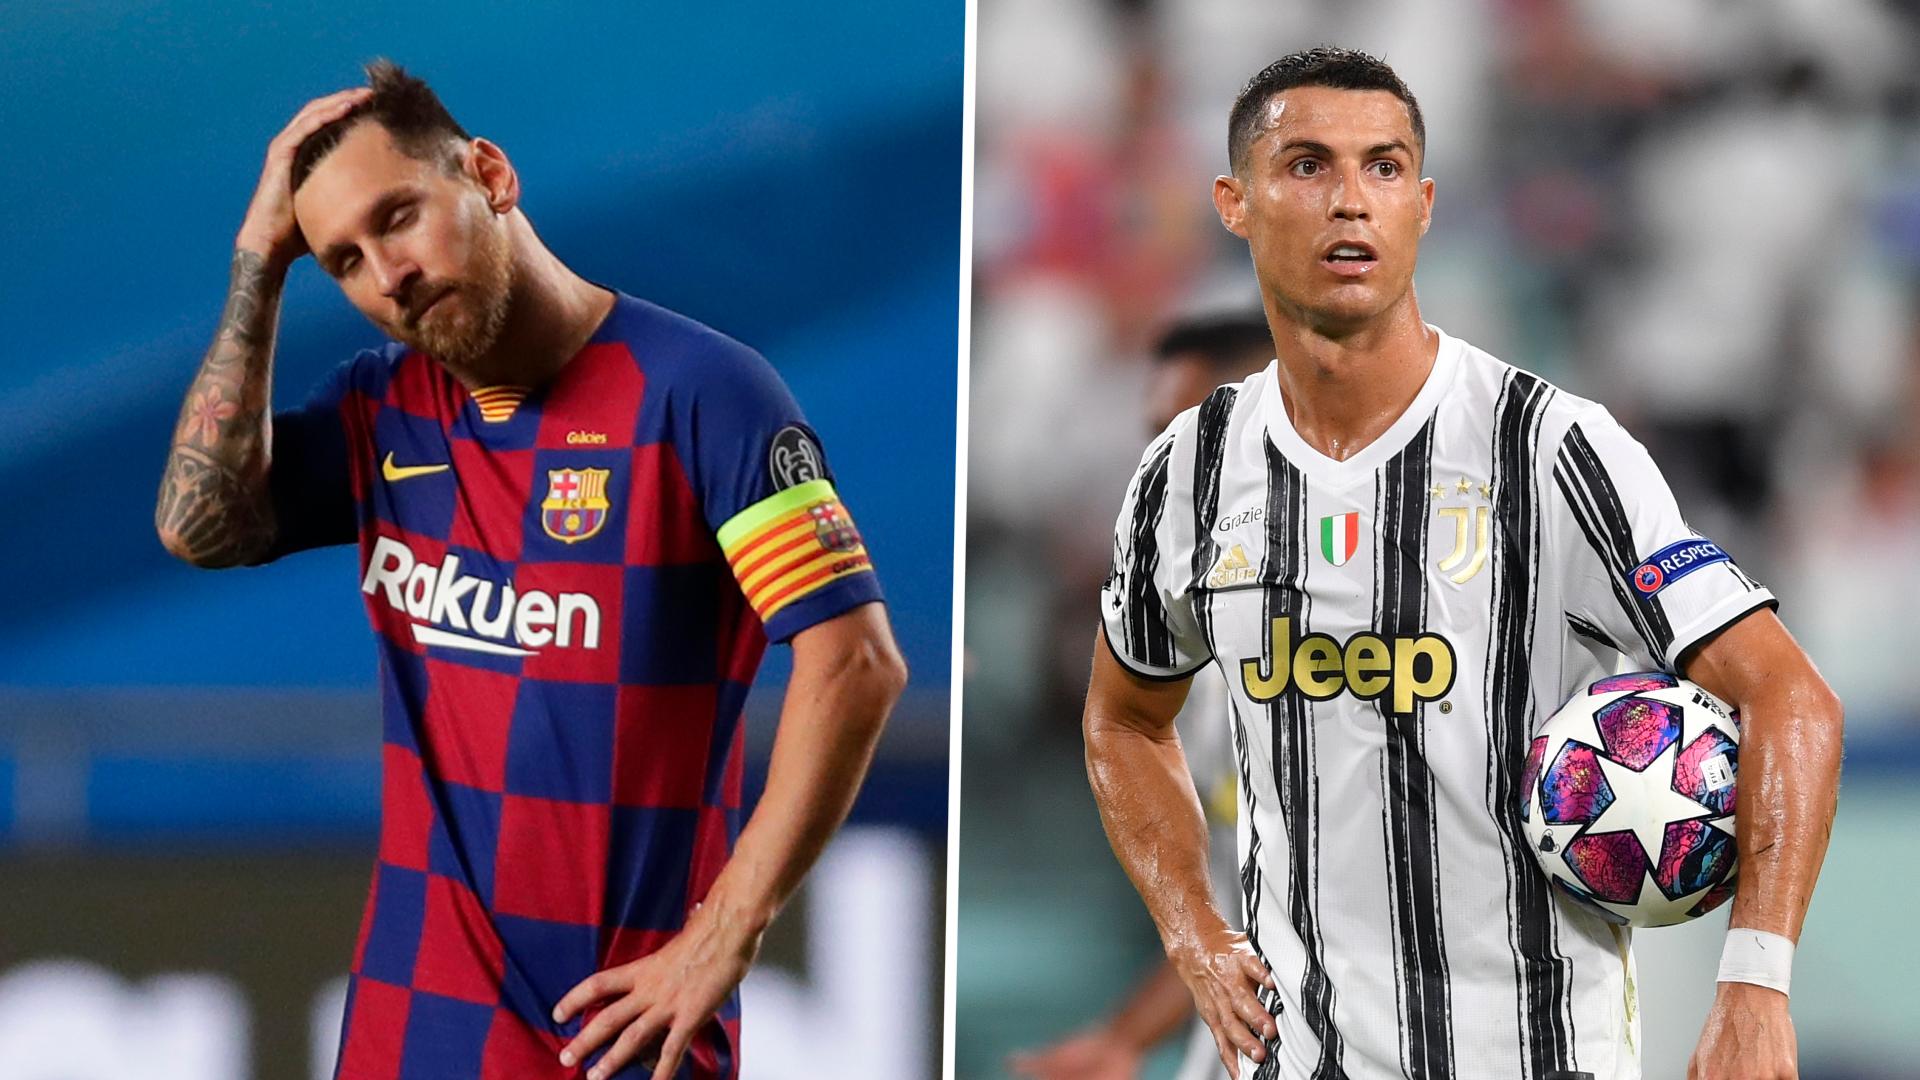 Cuadrado 'can't imagine' Barcelona icon Messi joining Ronaldo at Juventus